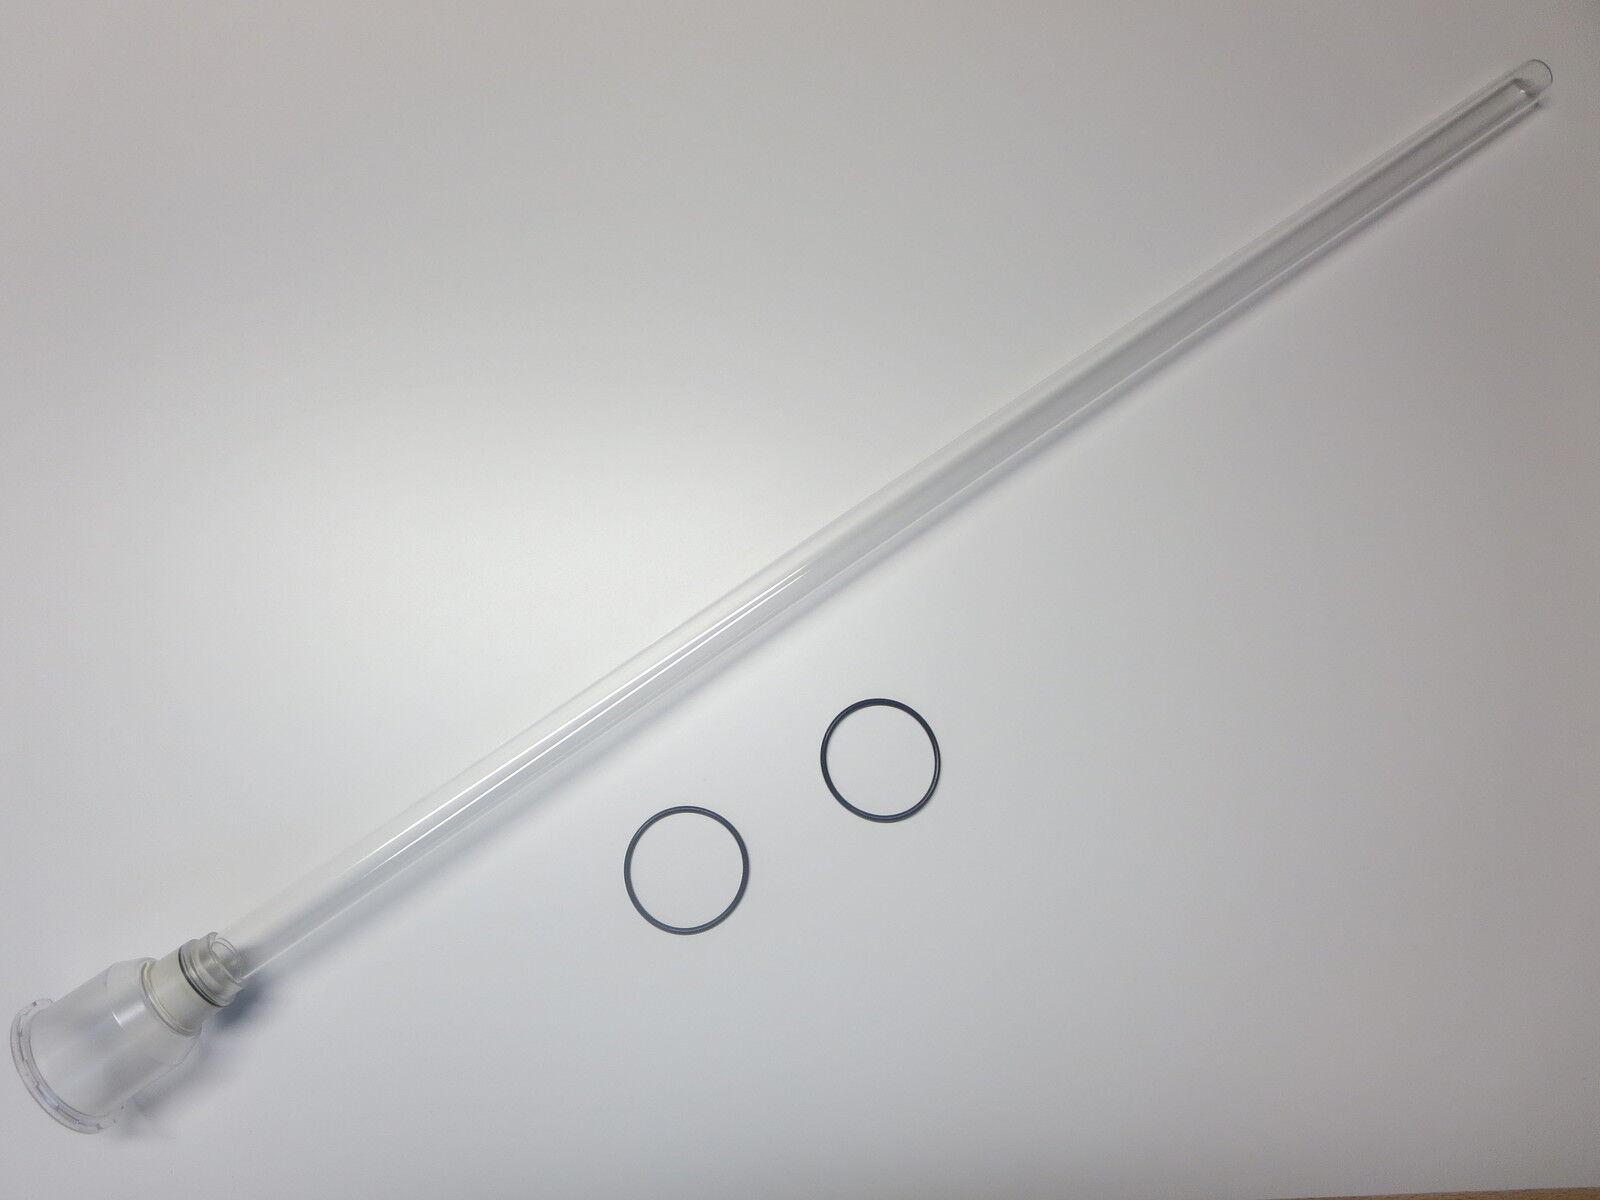 Vetro Quarzo per 40 75 Watt UVC Koi POWER TECH blu Lagoon Pro Jumbo UV vetro di ricambio